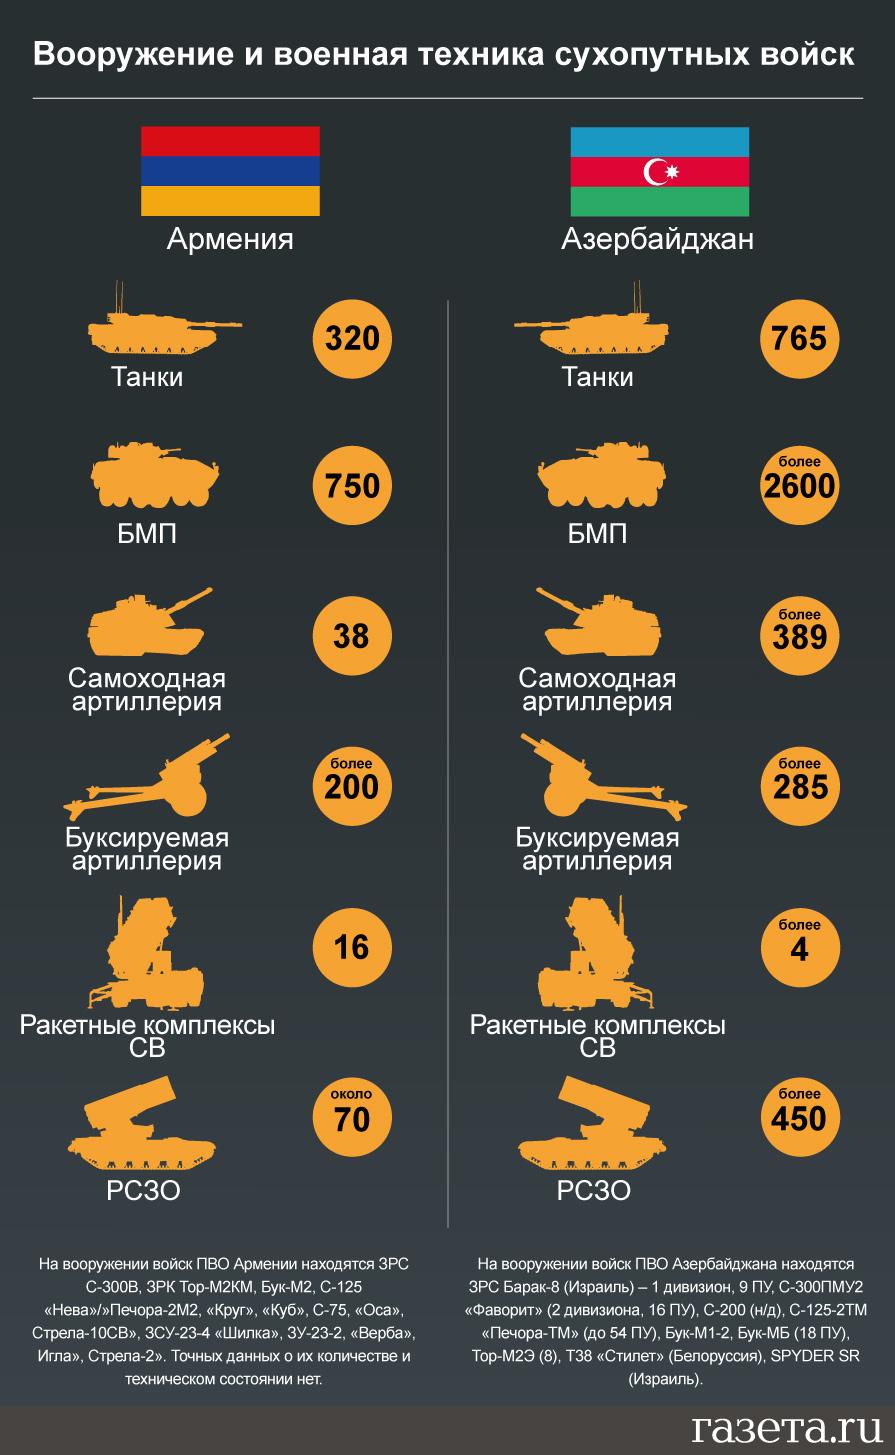 https://img.gazeta.ru/files3/497/13271497/gazeta_infografica1.jpg